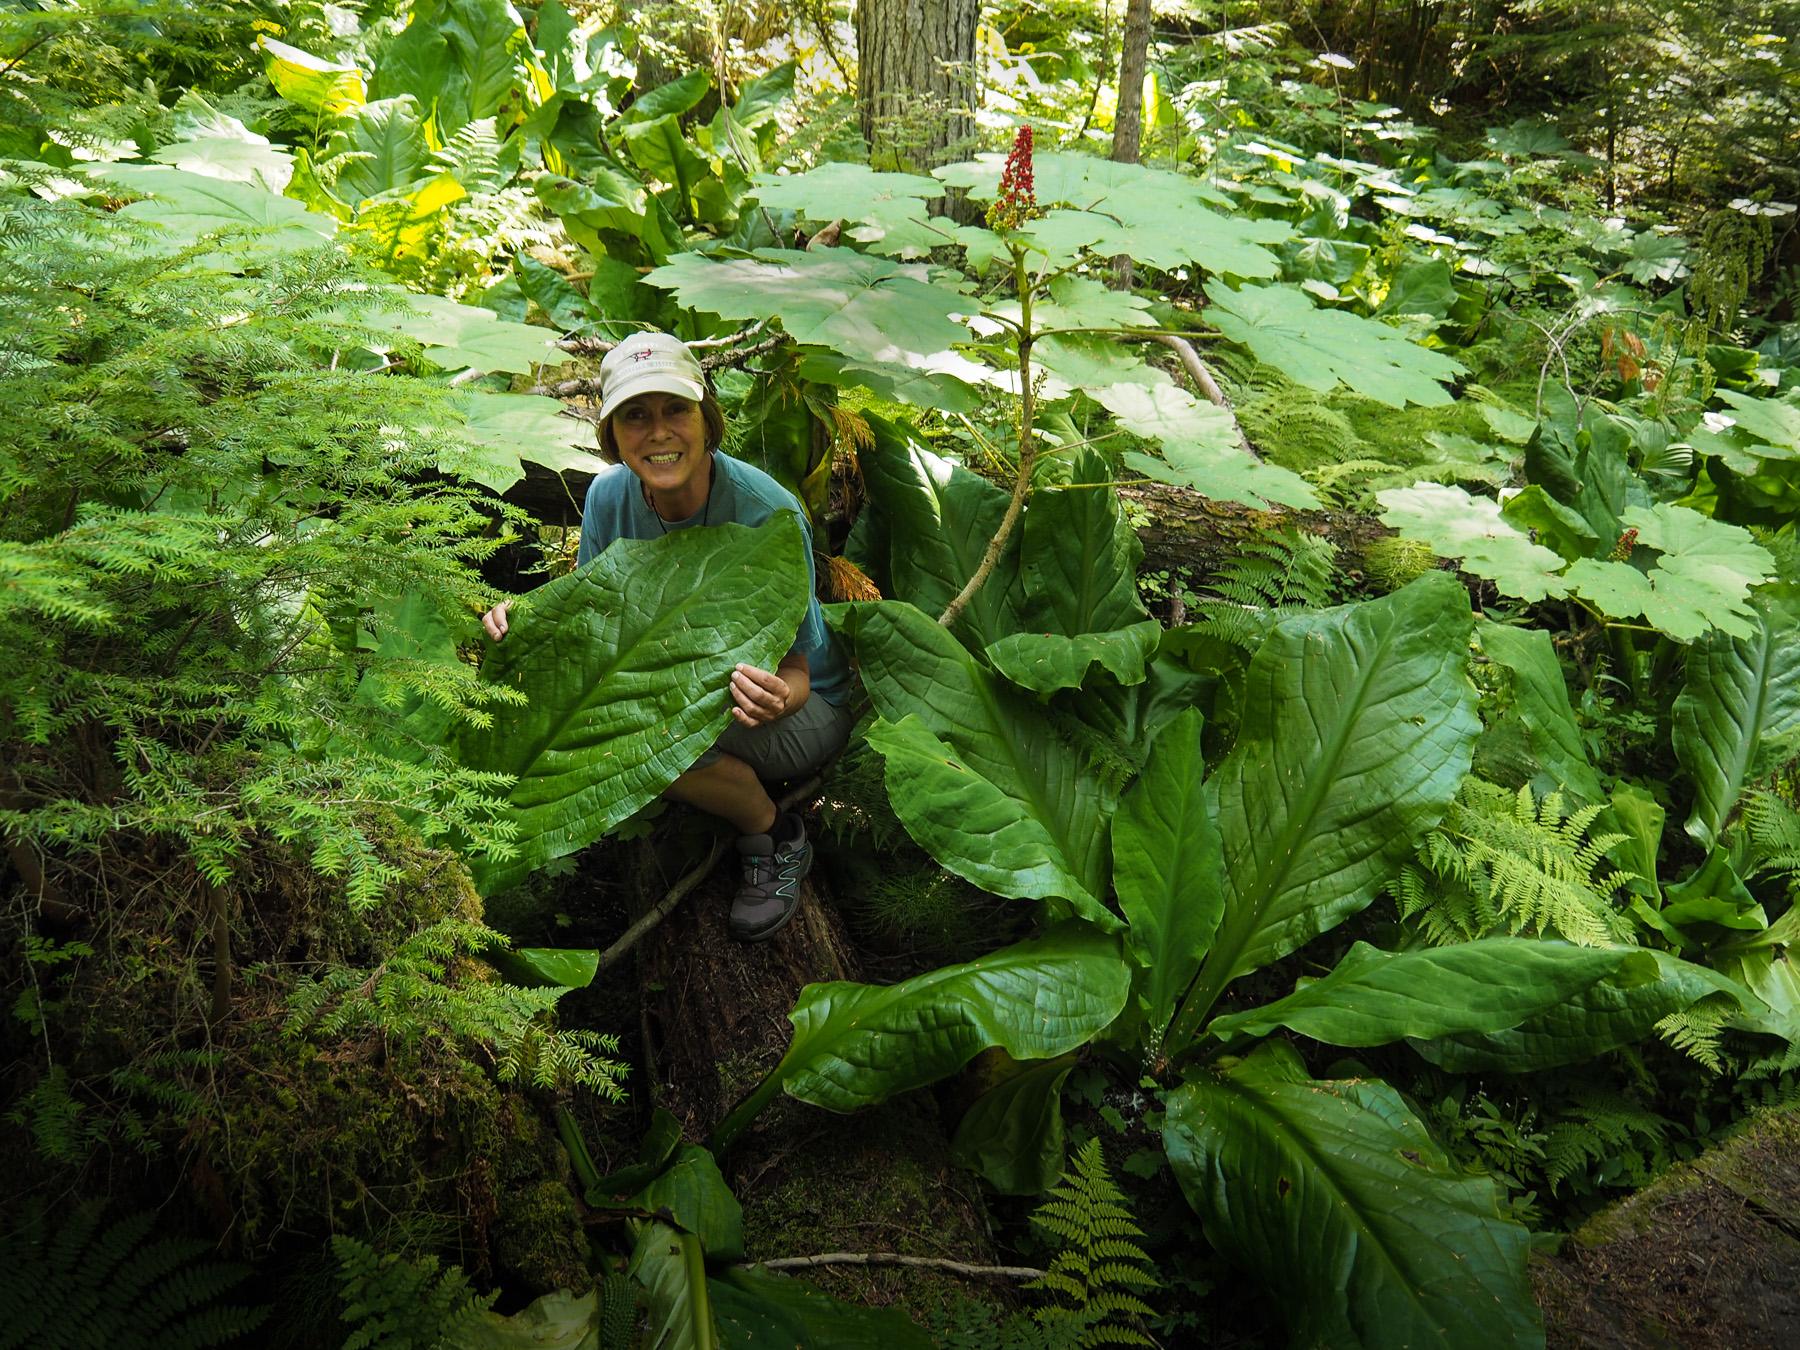 Wälder mit üppiger Vegitation